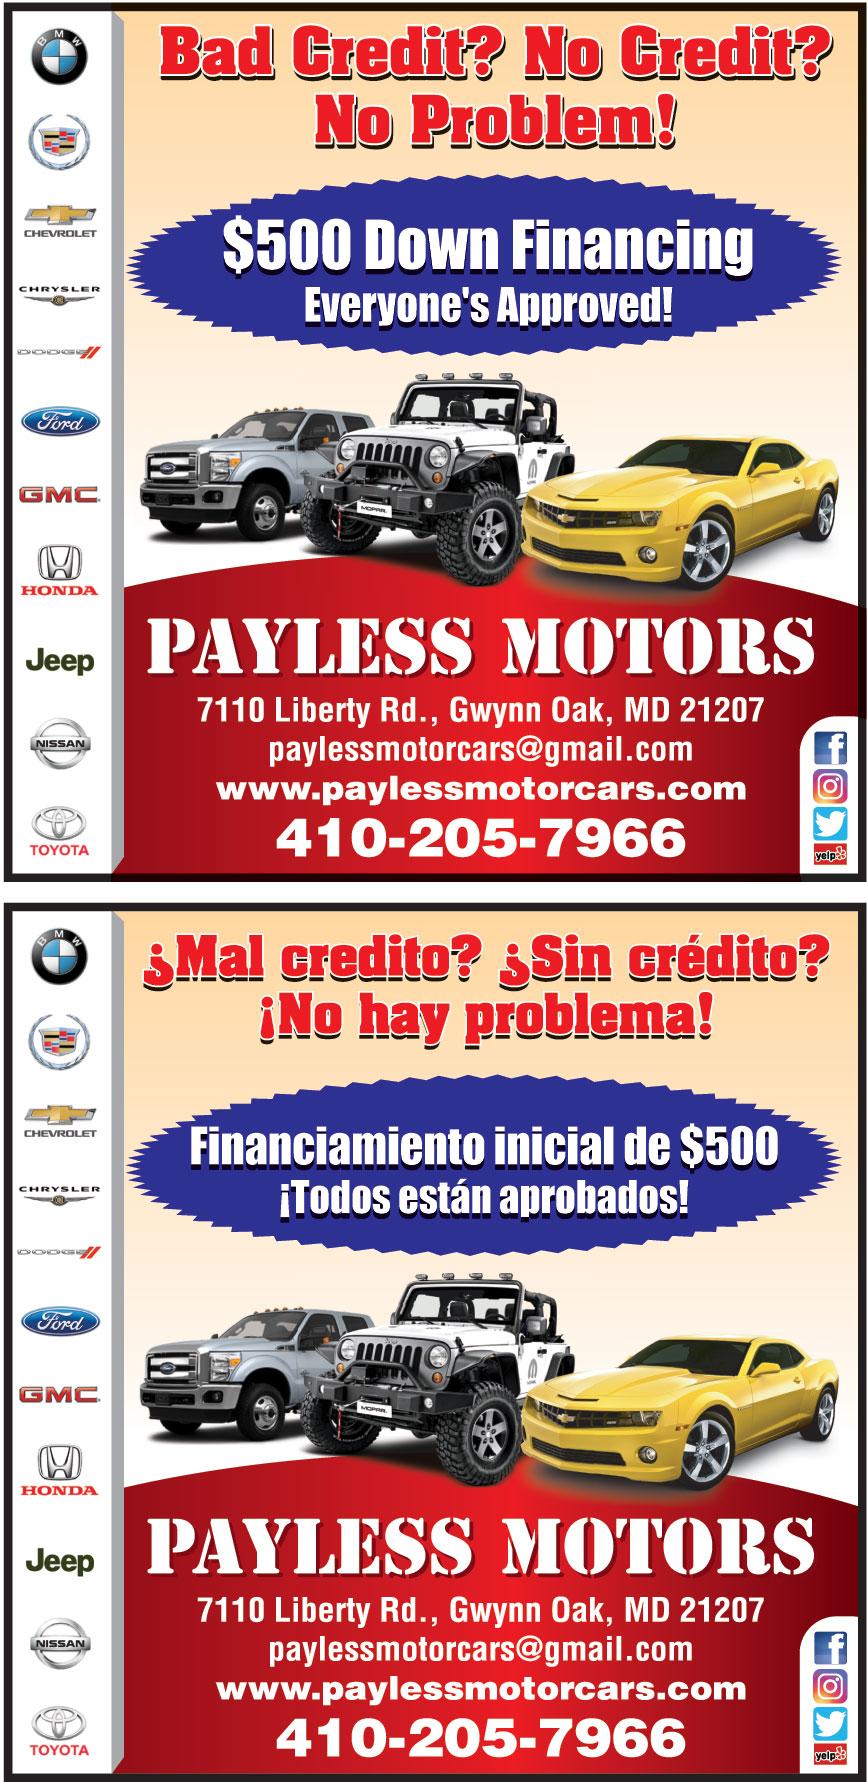 PAYLESS MOTORS